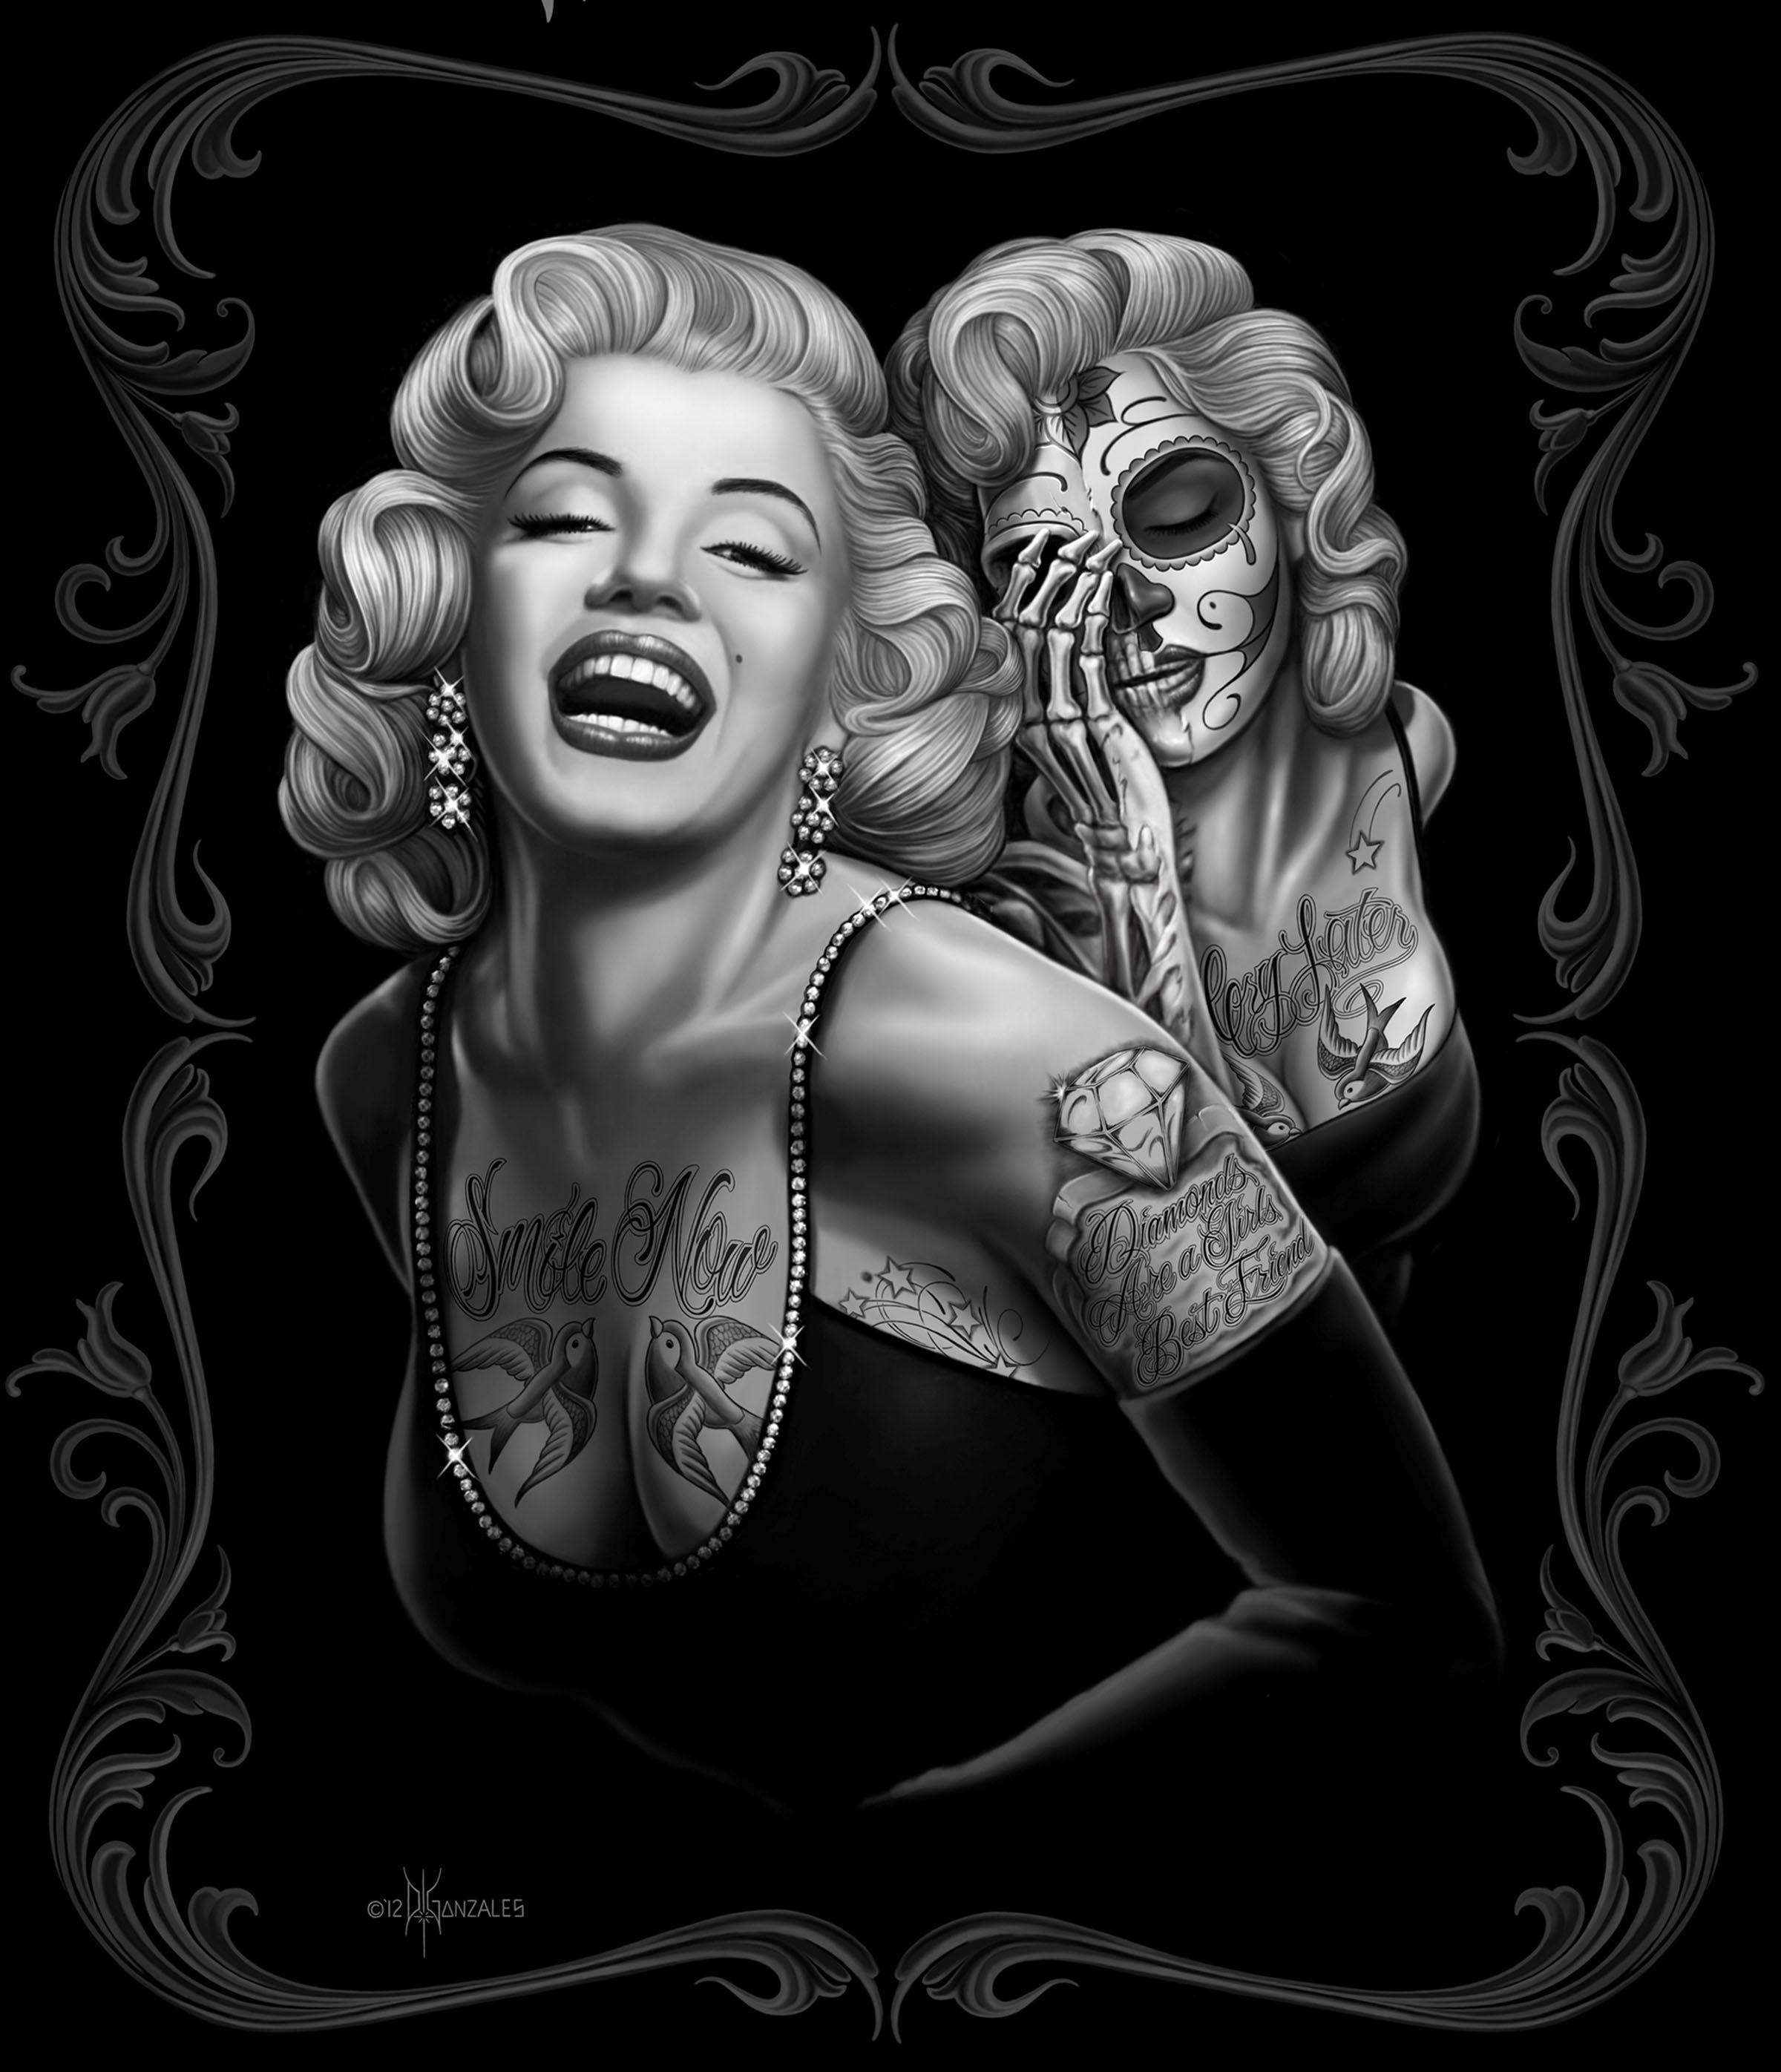 Marilyn monroe smile now blanket buy it wholesale online for Marilyn monroe tattoo canvas